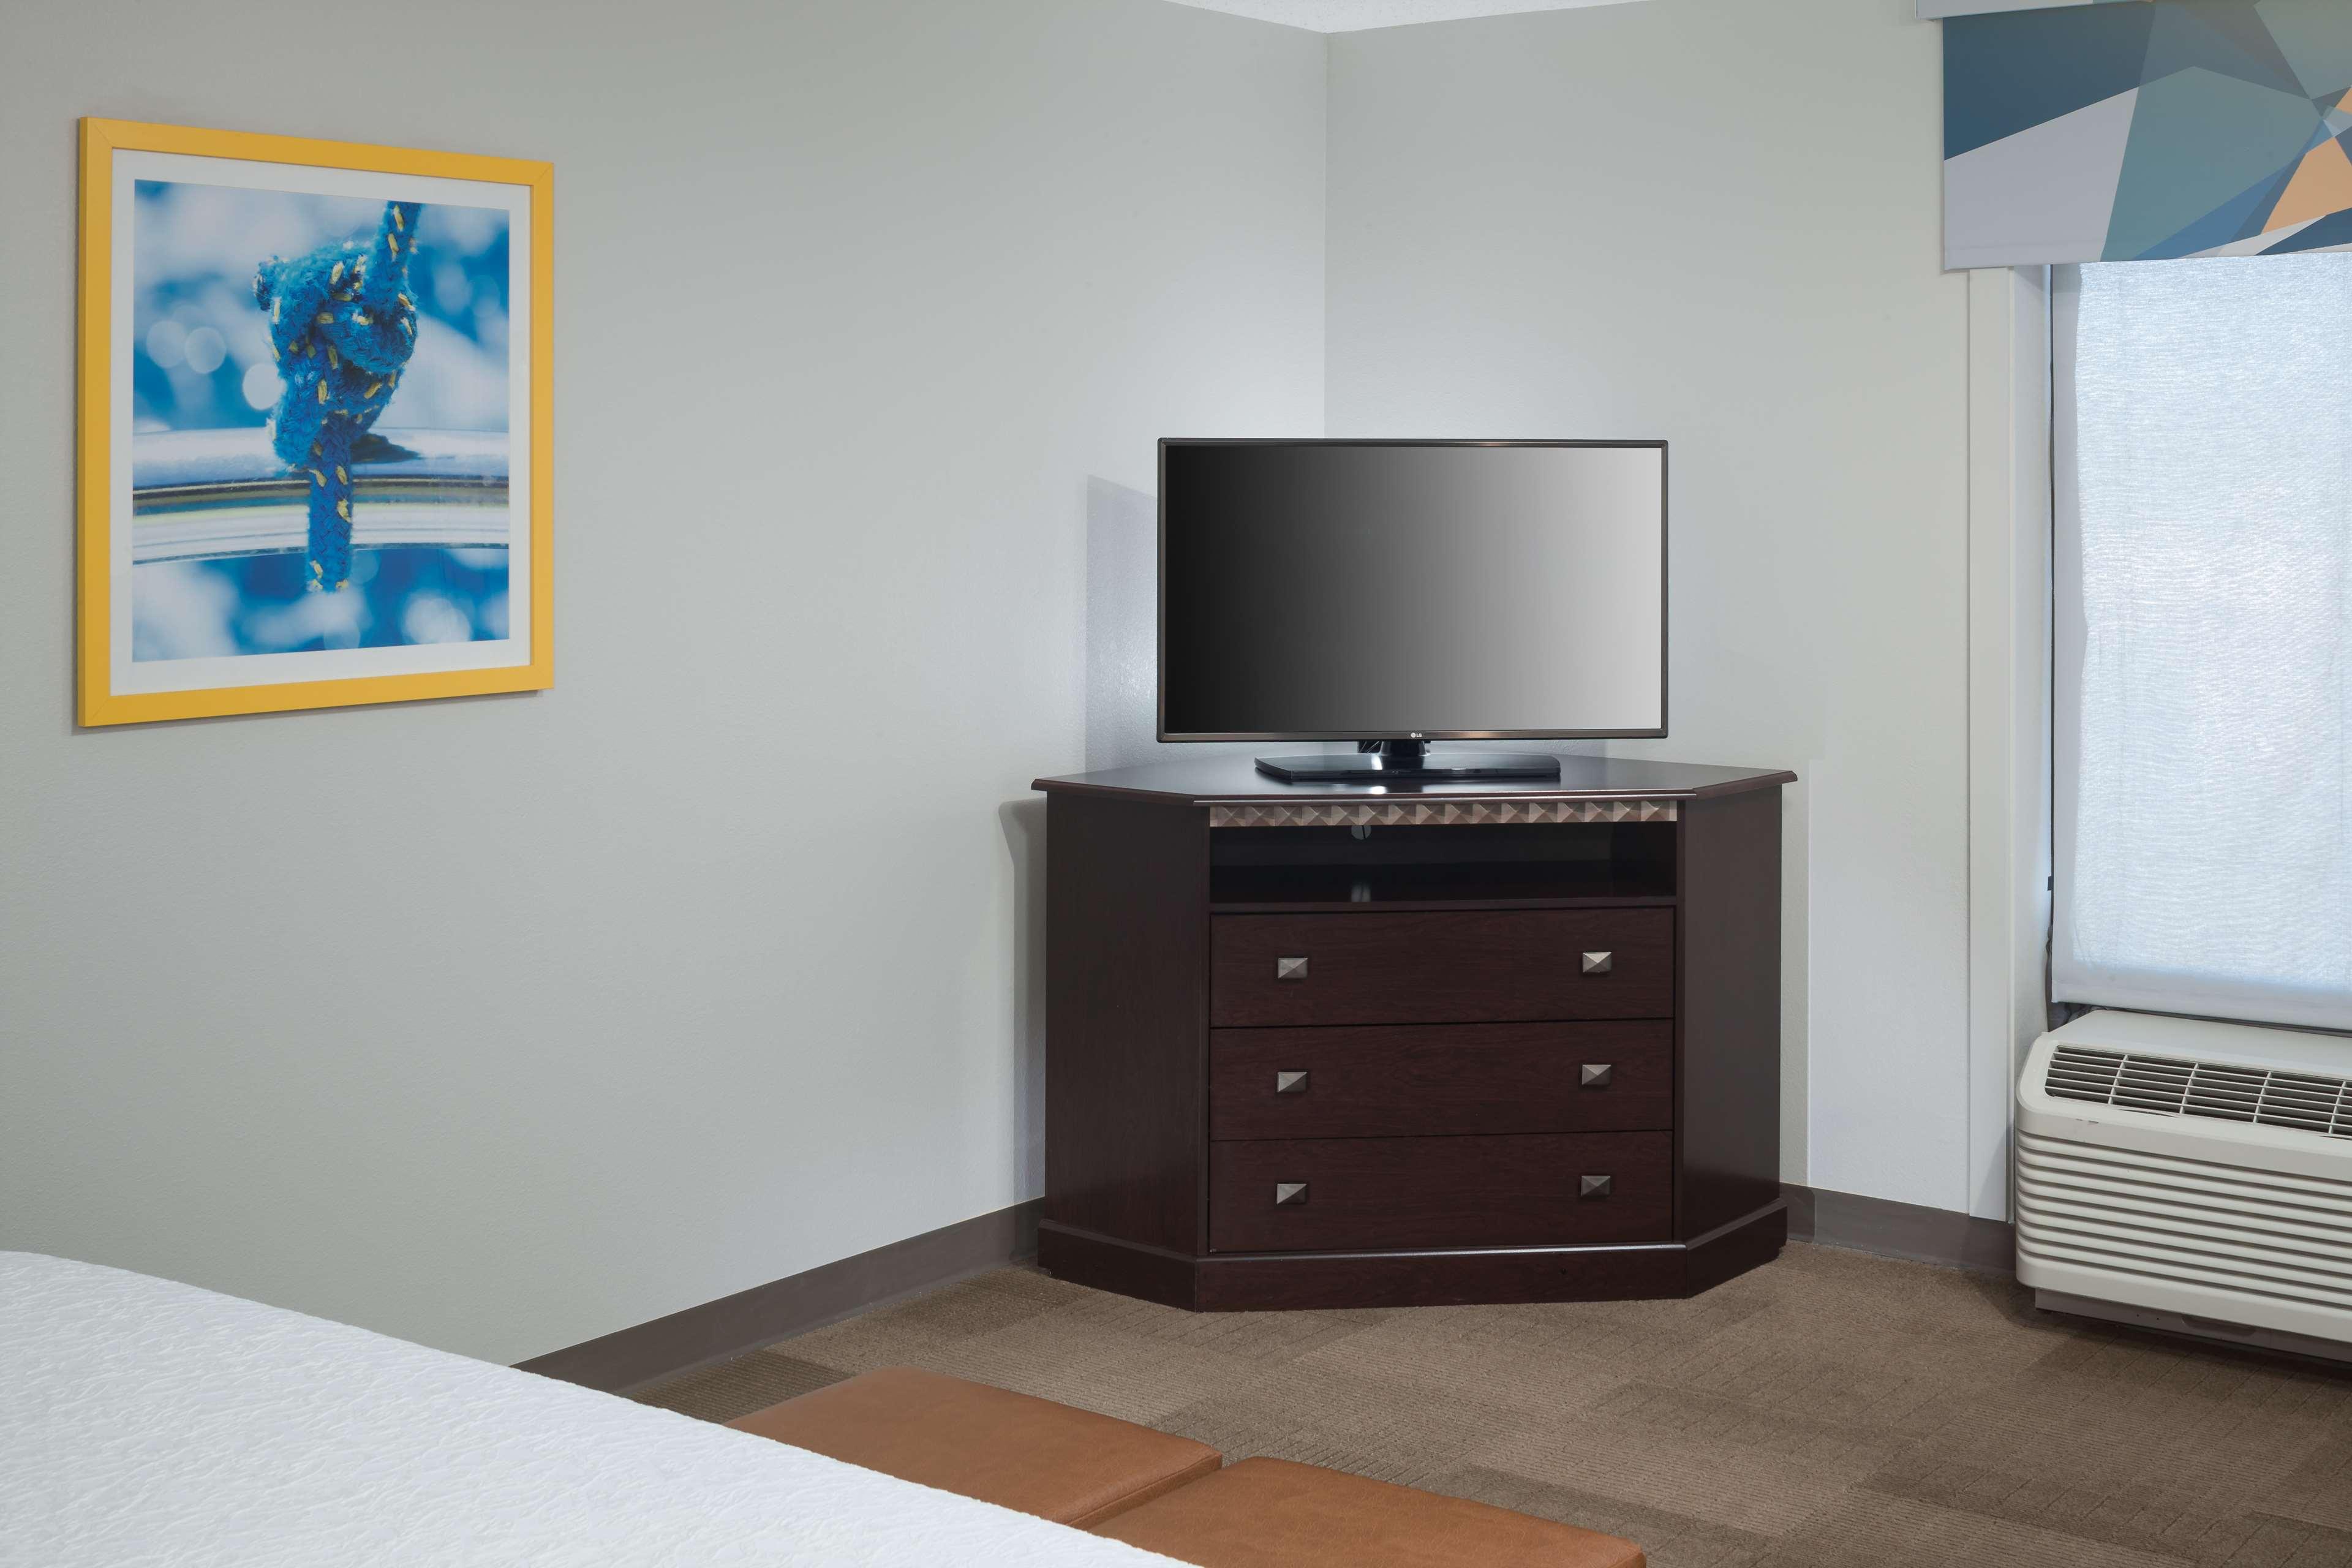 Hampton Inn & Suites Panama City Beach-Pier Park Area image 17